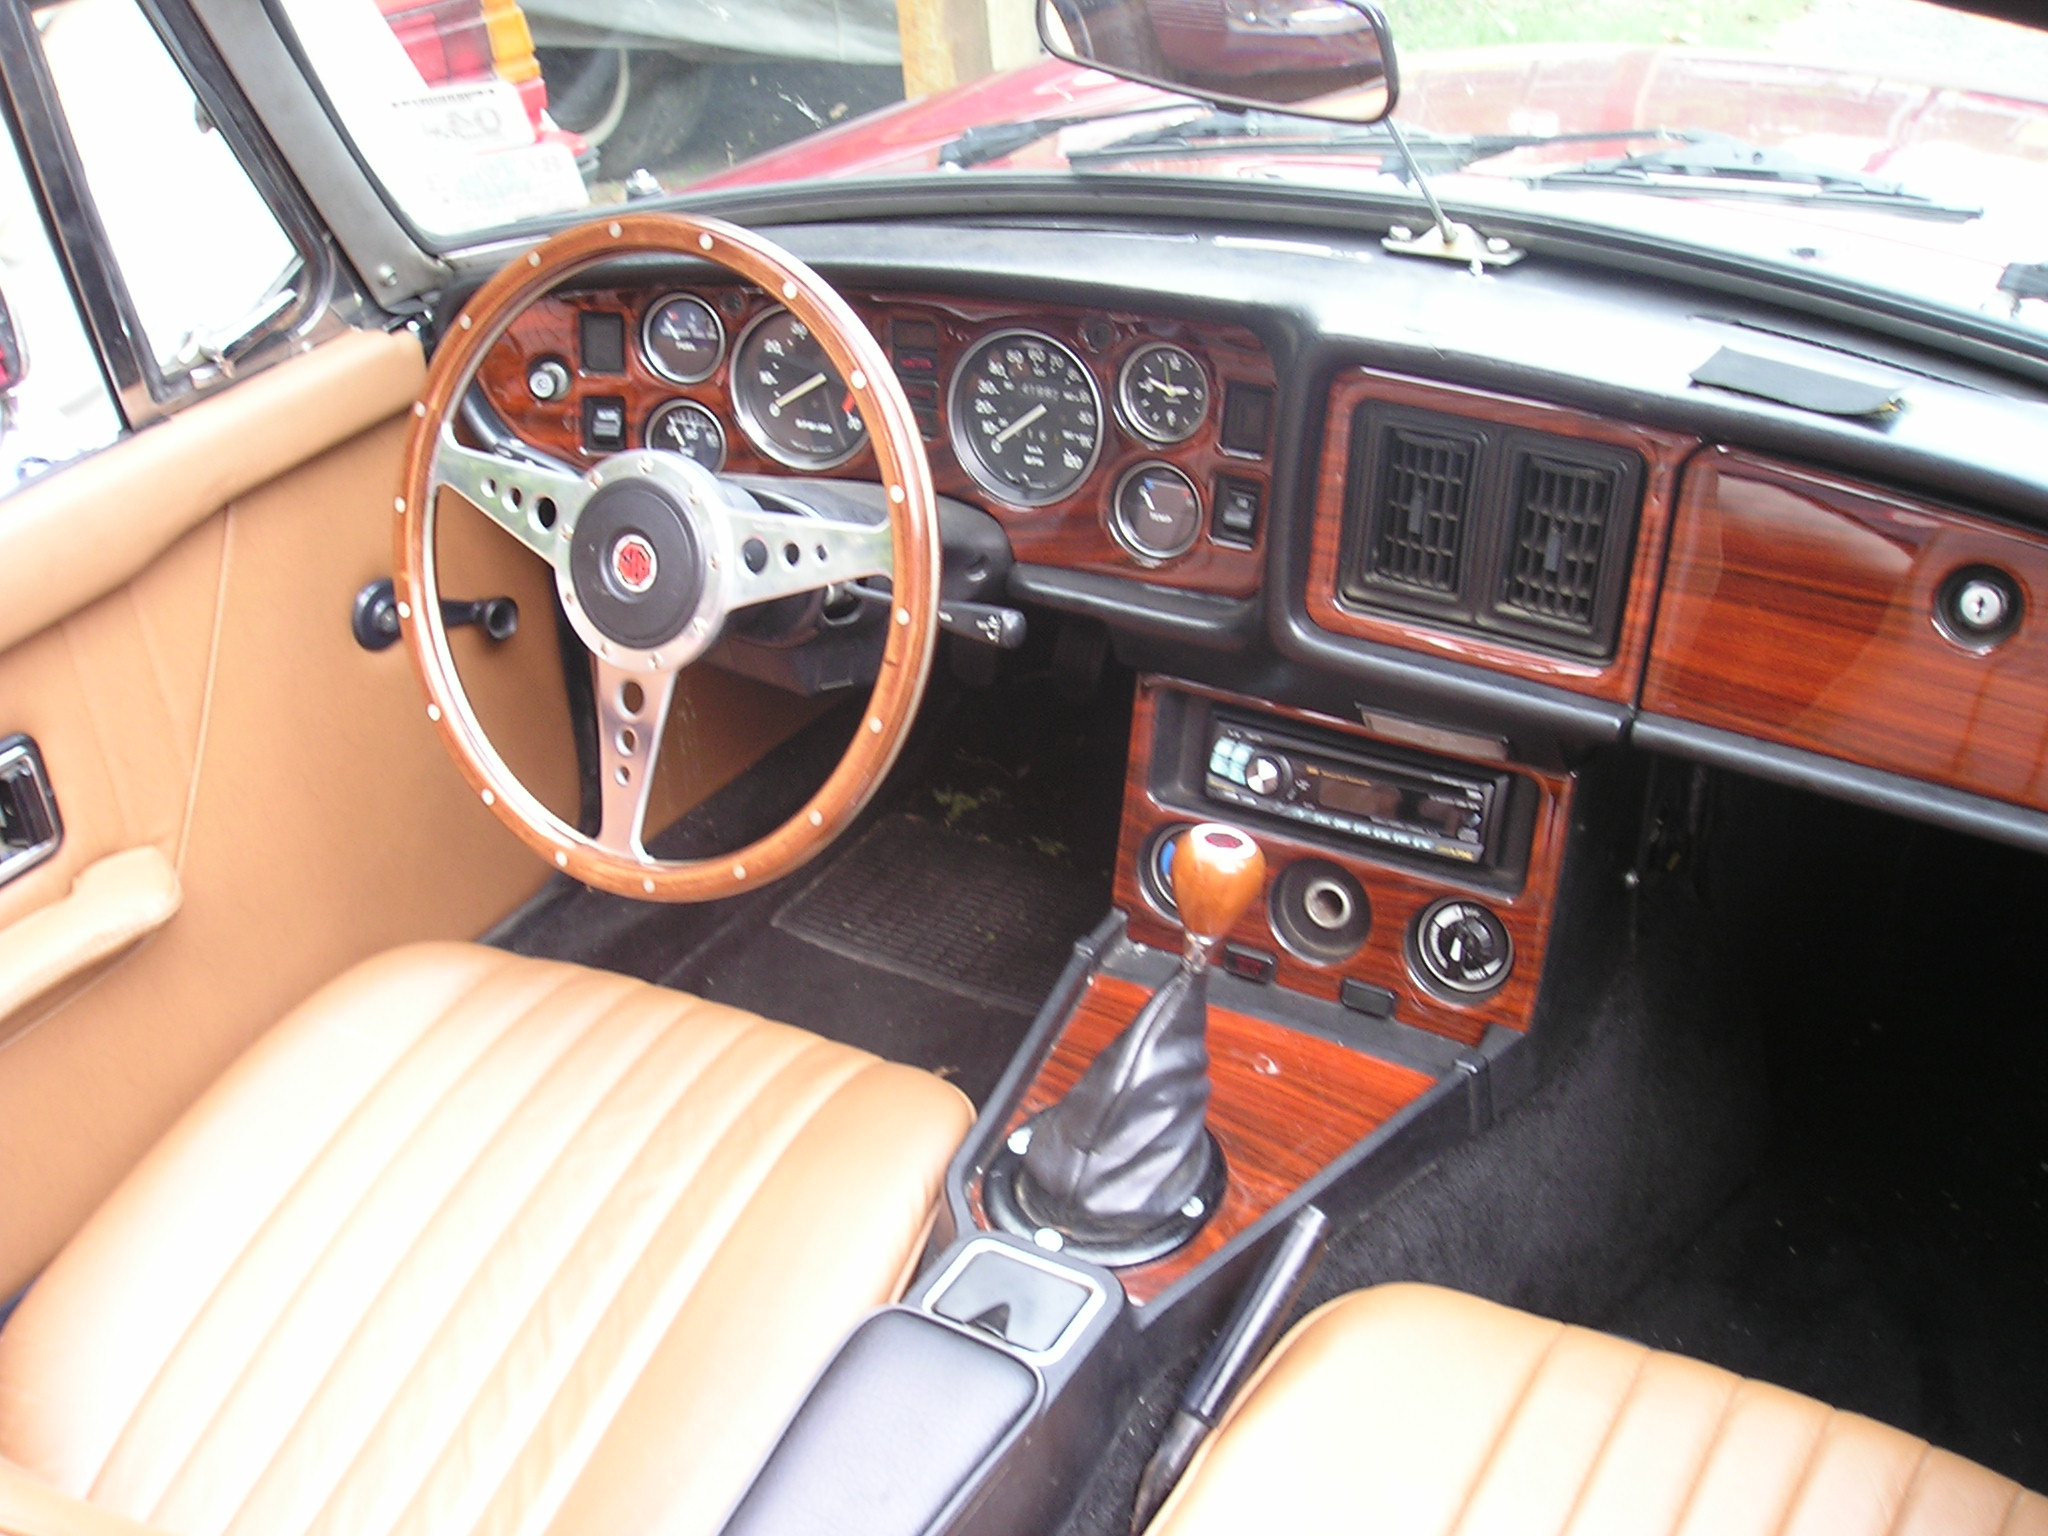 British Car Accessories like KONI shocks, ANSA exhaust,